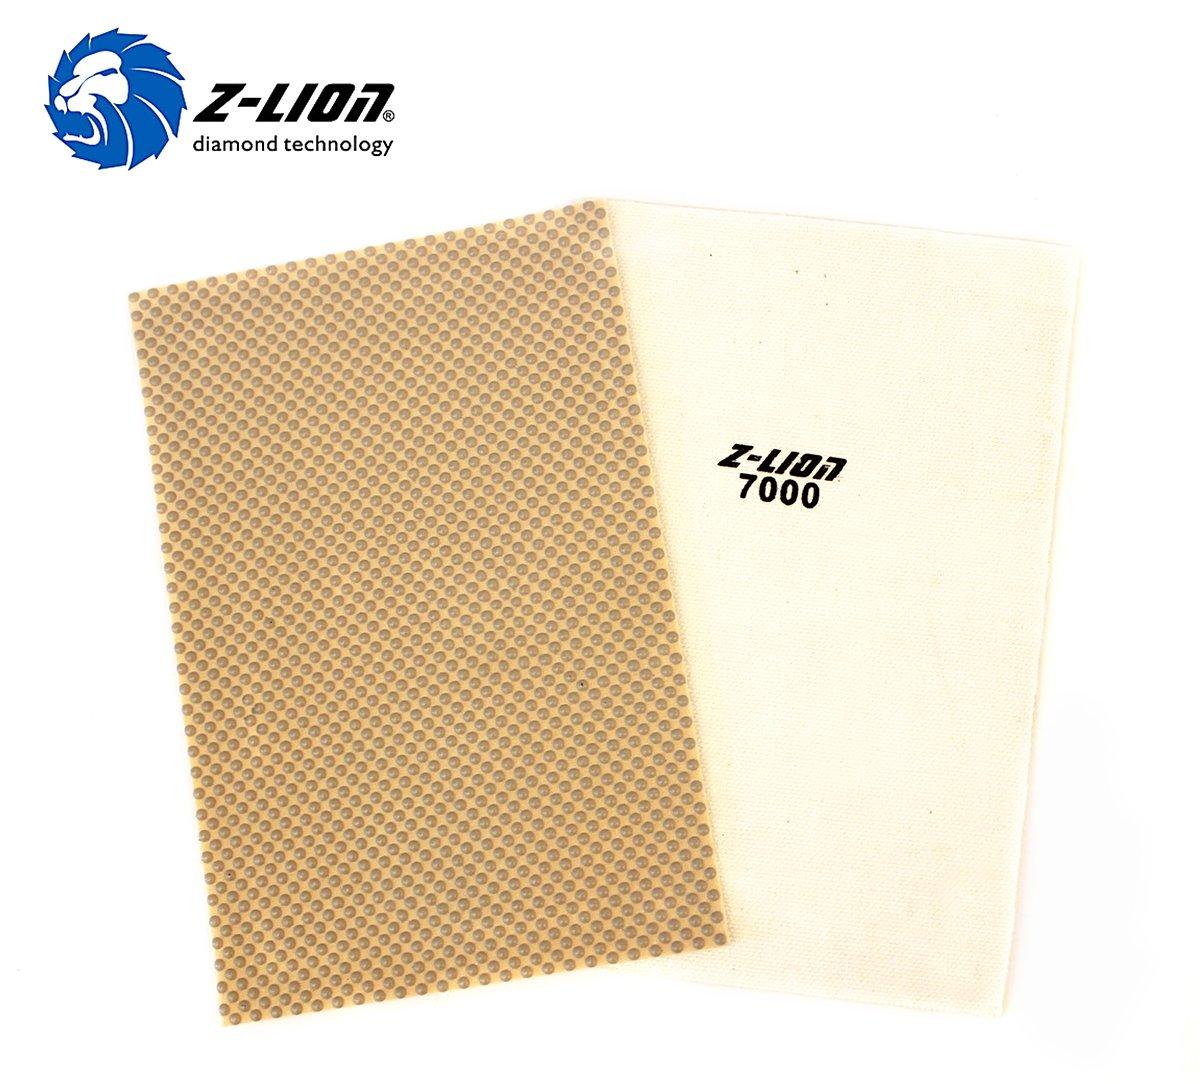 Z-Lion Diamond Resin Abrasive Paper Sheets Diamond Sandpaper for Grinding Stone Glass Ceramic Diamond Tool(4 Pcs/lot)